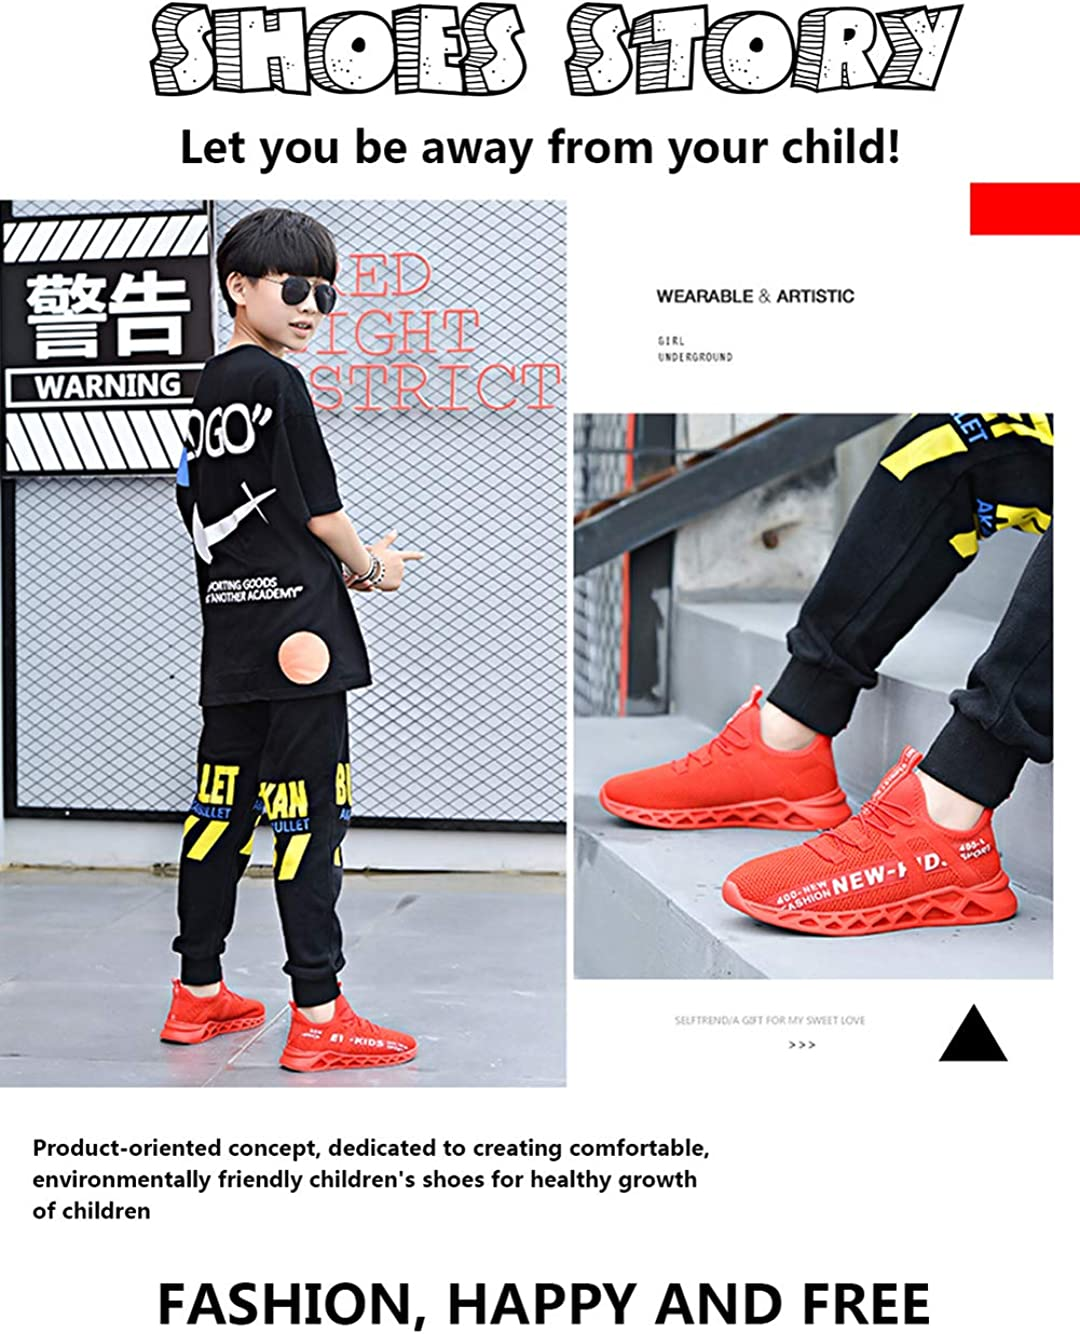 Fille Gar/çon Chaussures de Course Tennis Fitness Sneakers Femme Walking Shoes Baskets Mode Mixte Enfant Running Sneakers 21-29